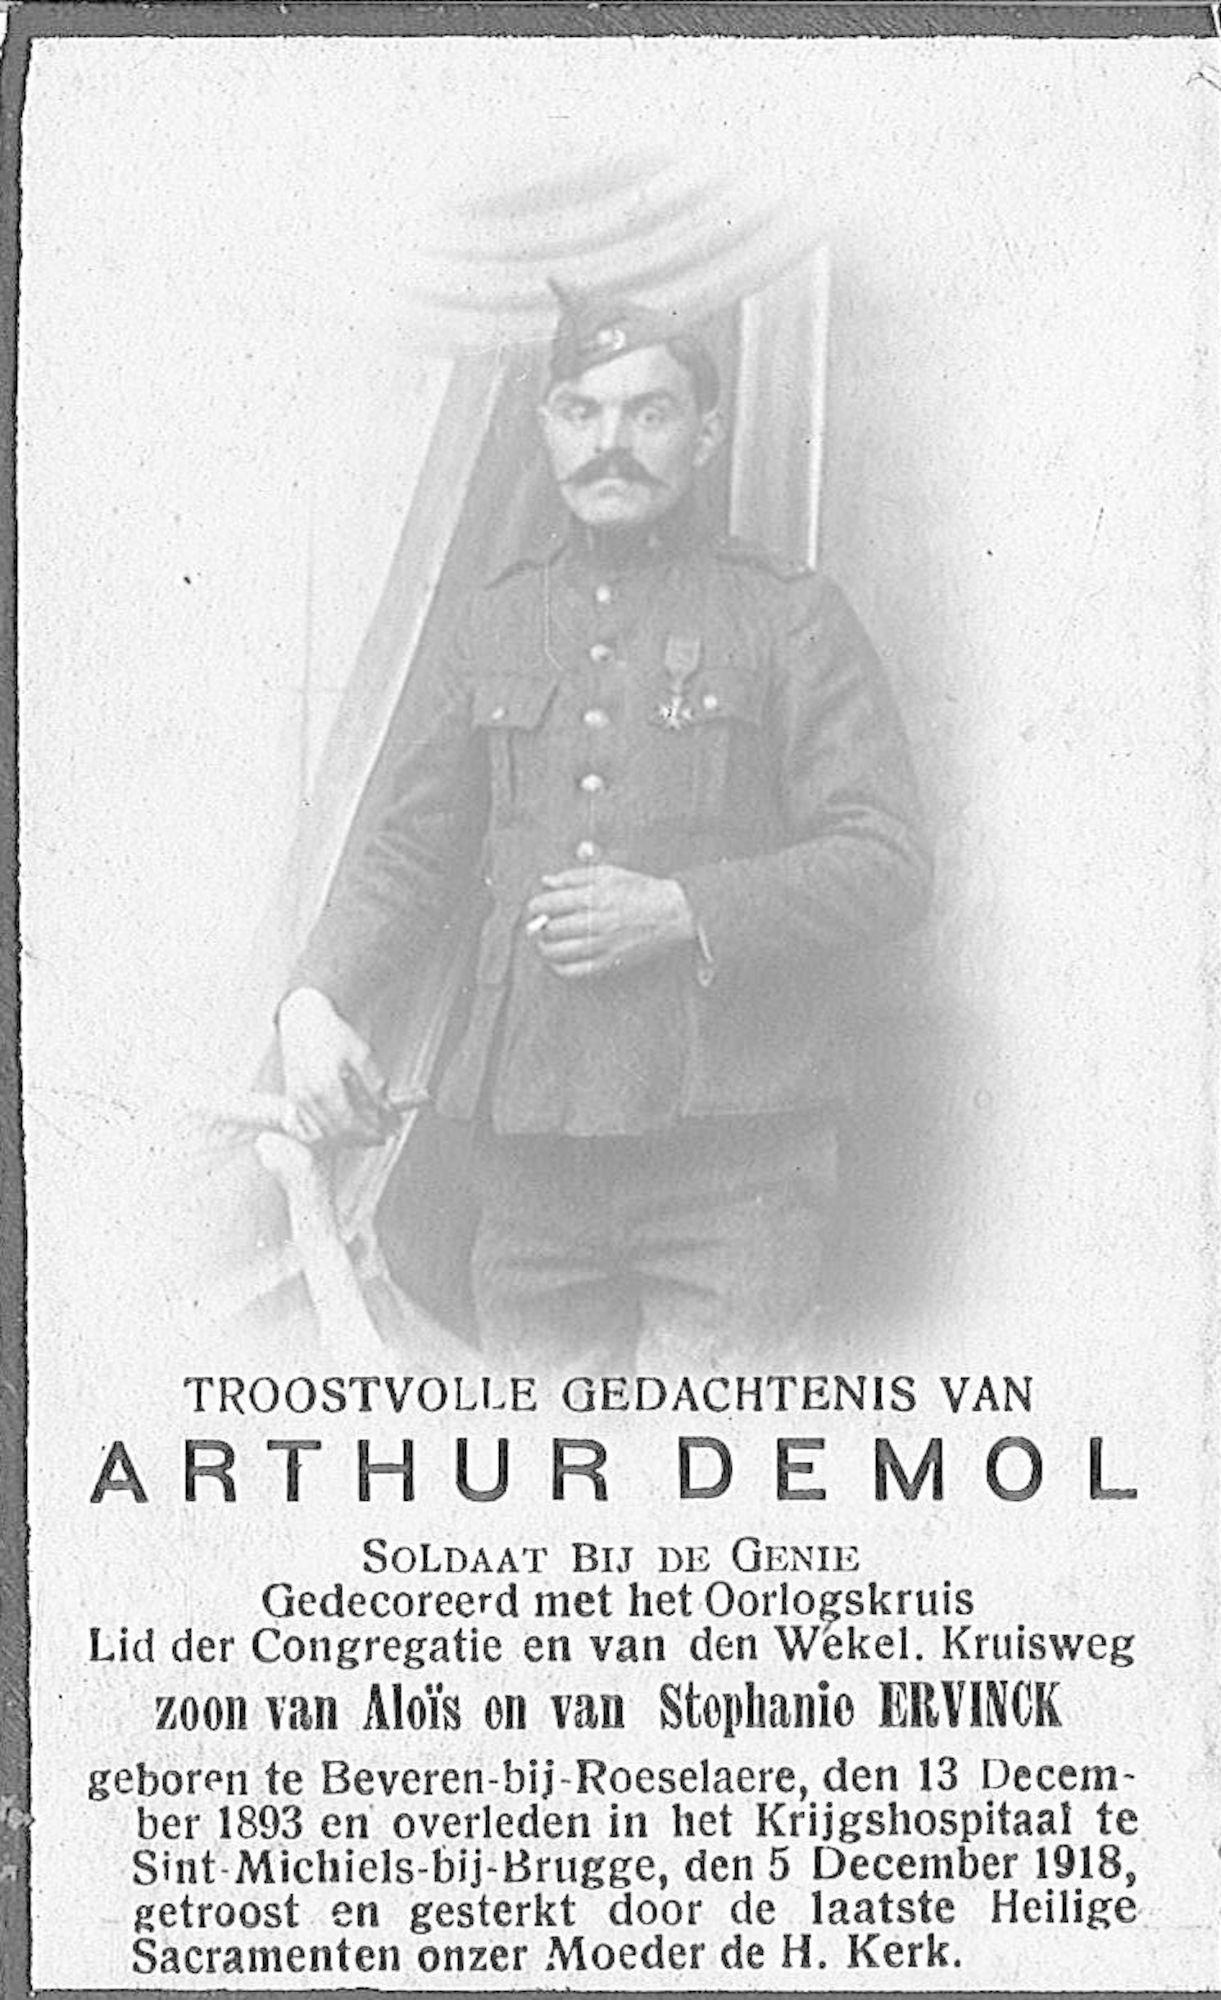 Arthur Demol